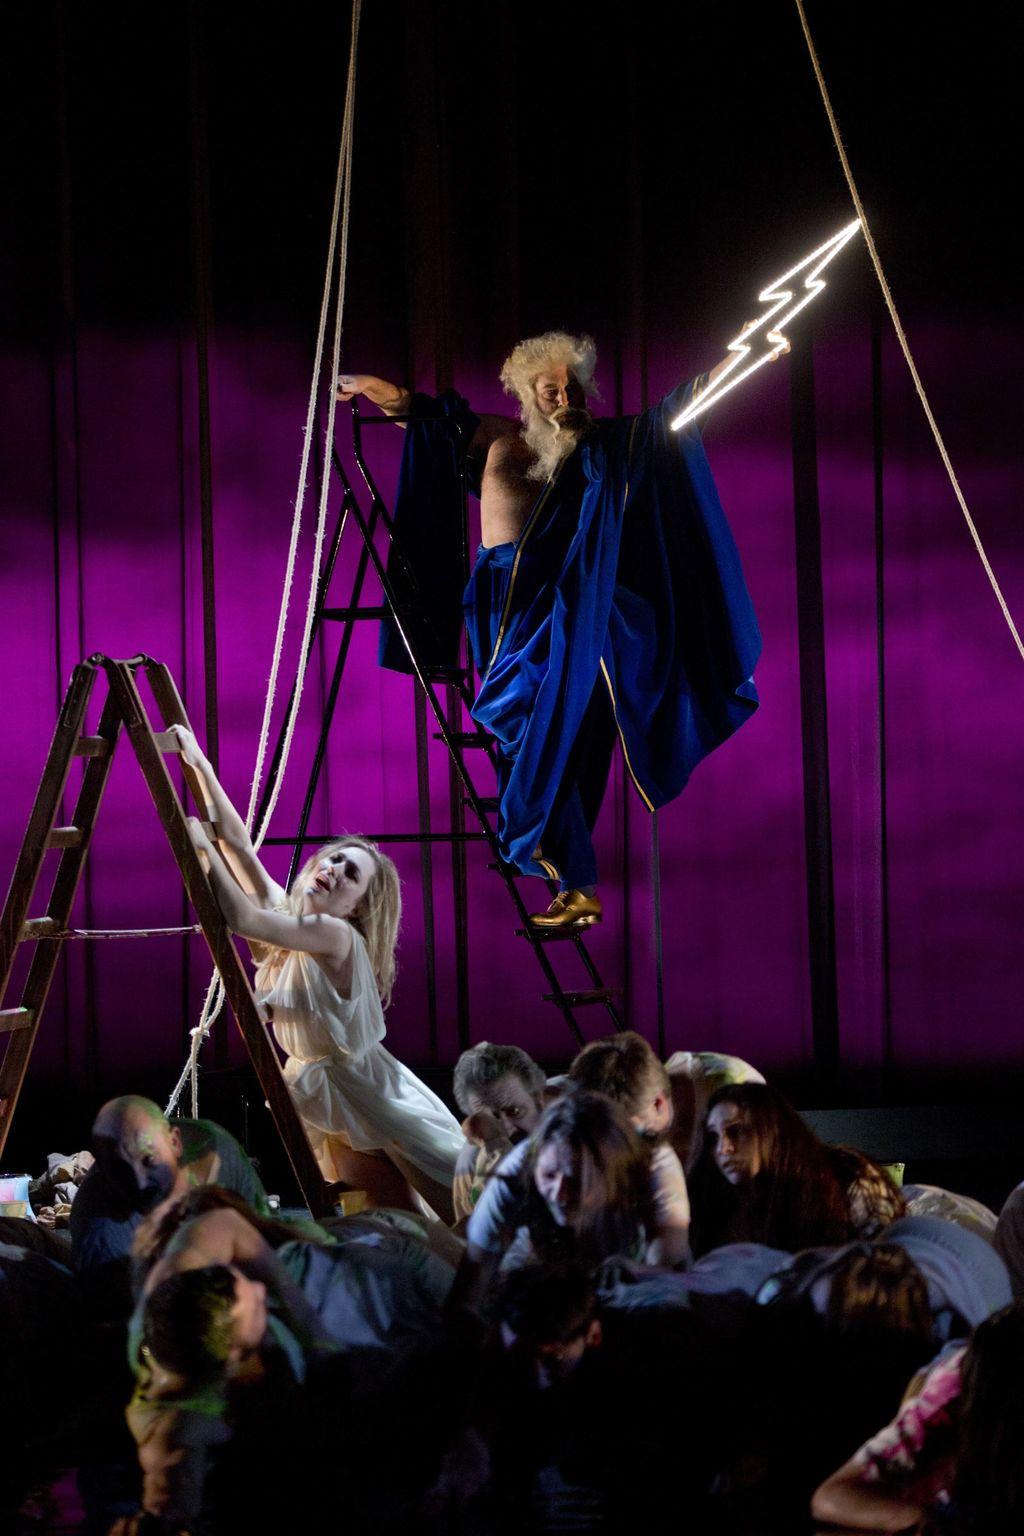 philemon-baucis-gounod-renaissance-opera-tours_width1024.jpg